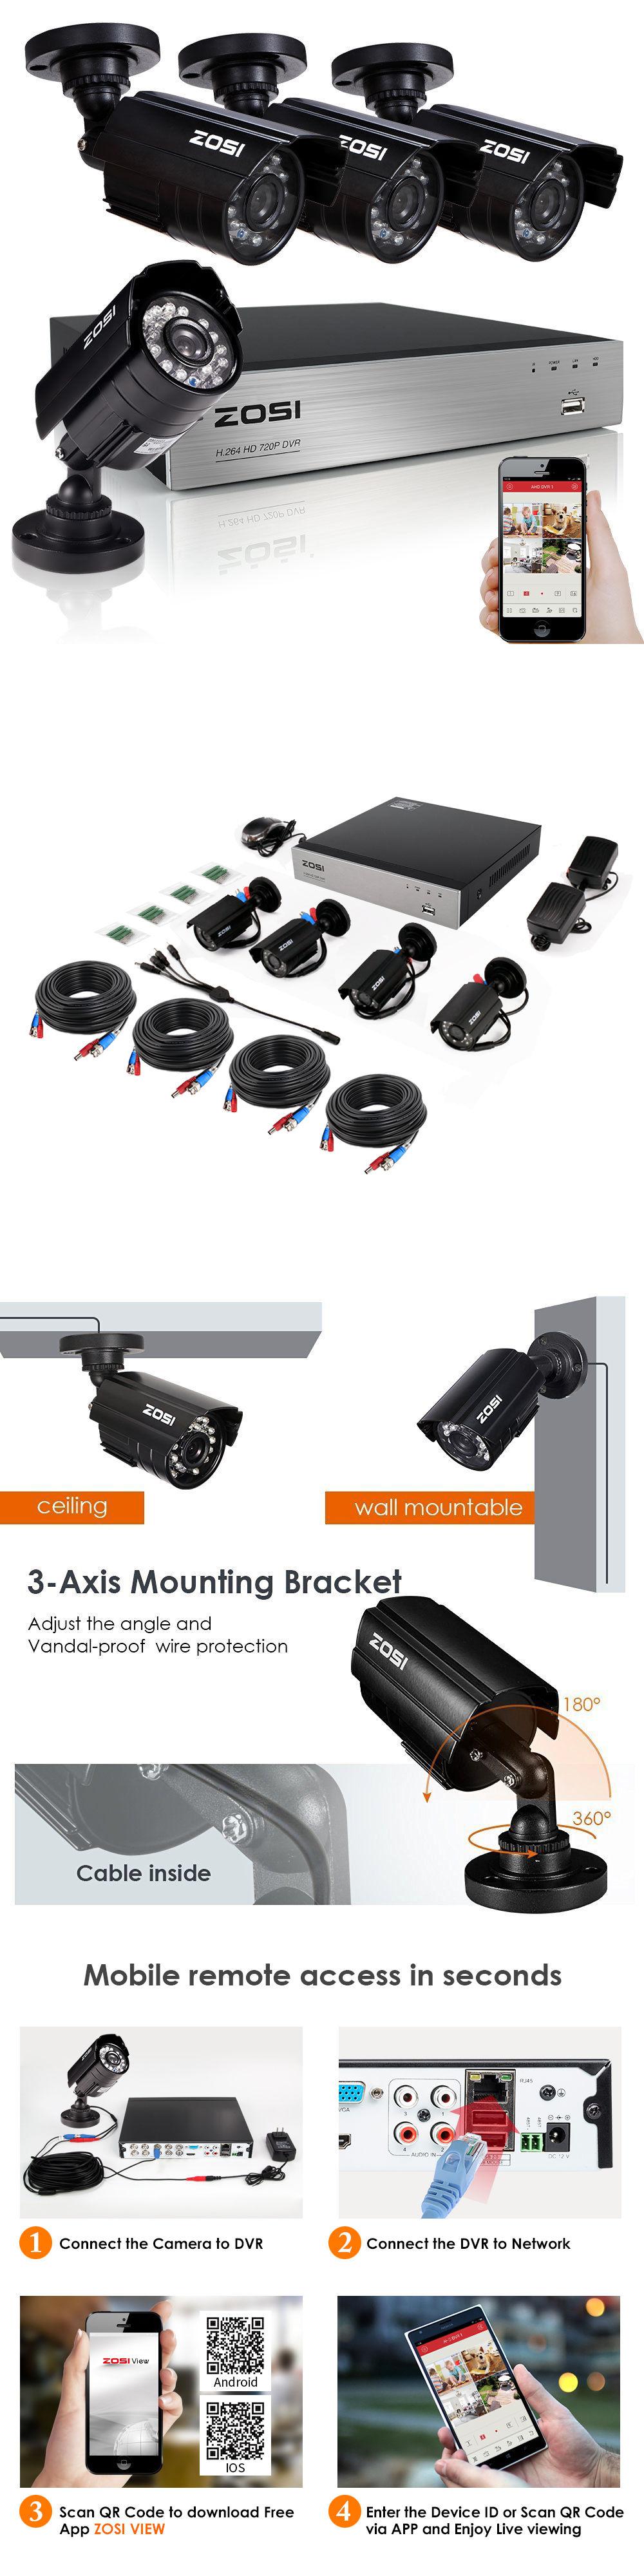 Surveillance Security Systems: Zosi Hd 720P 4Ch Hdmi Dvr 1500Tvl ...